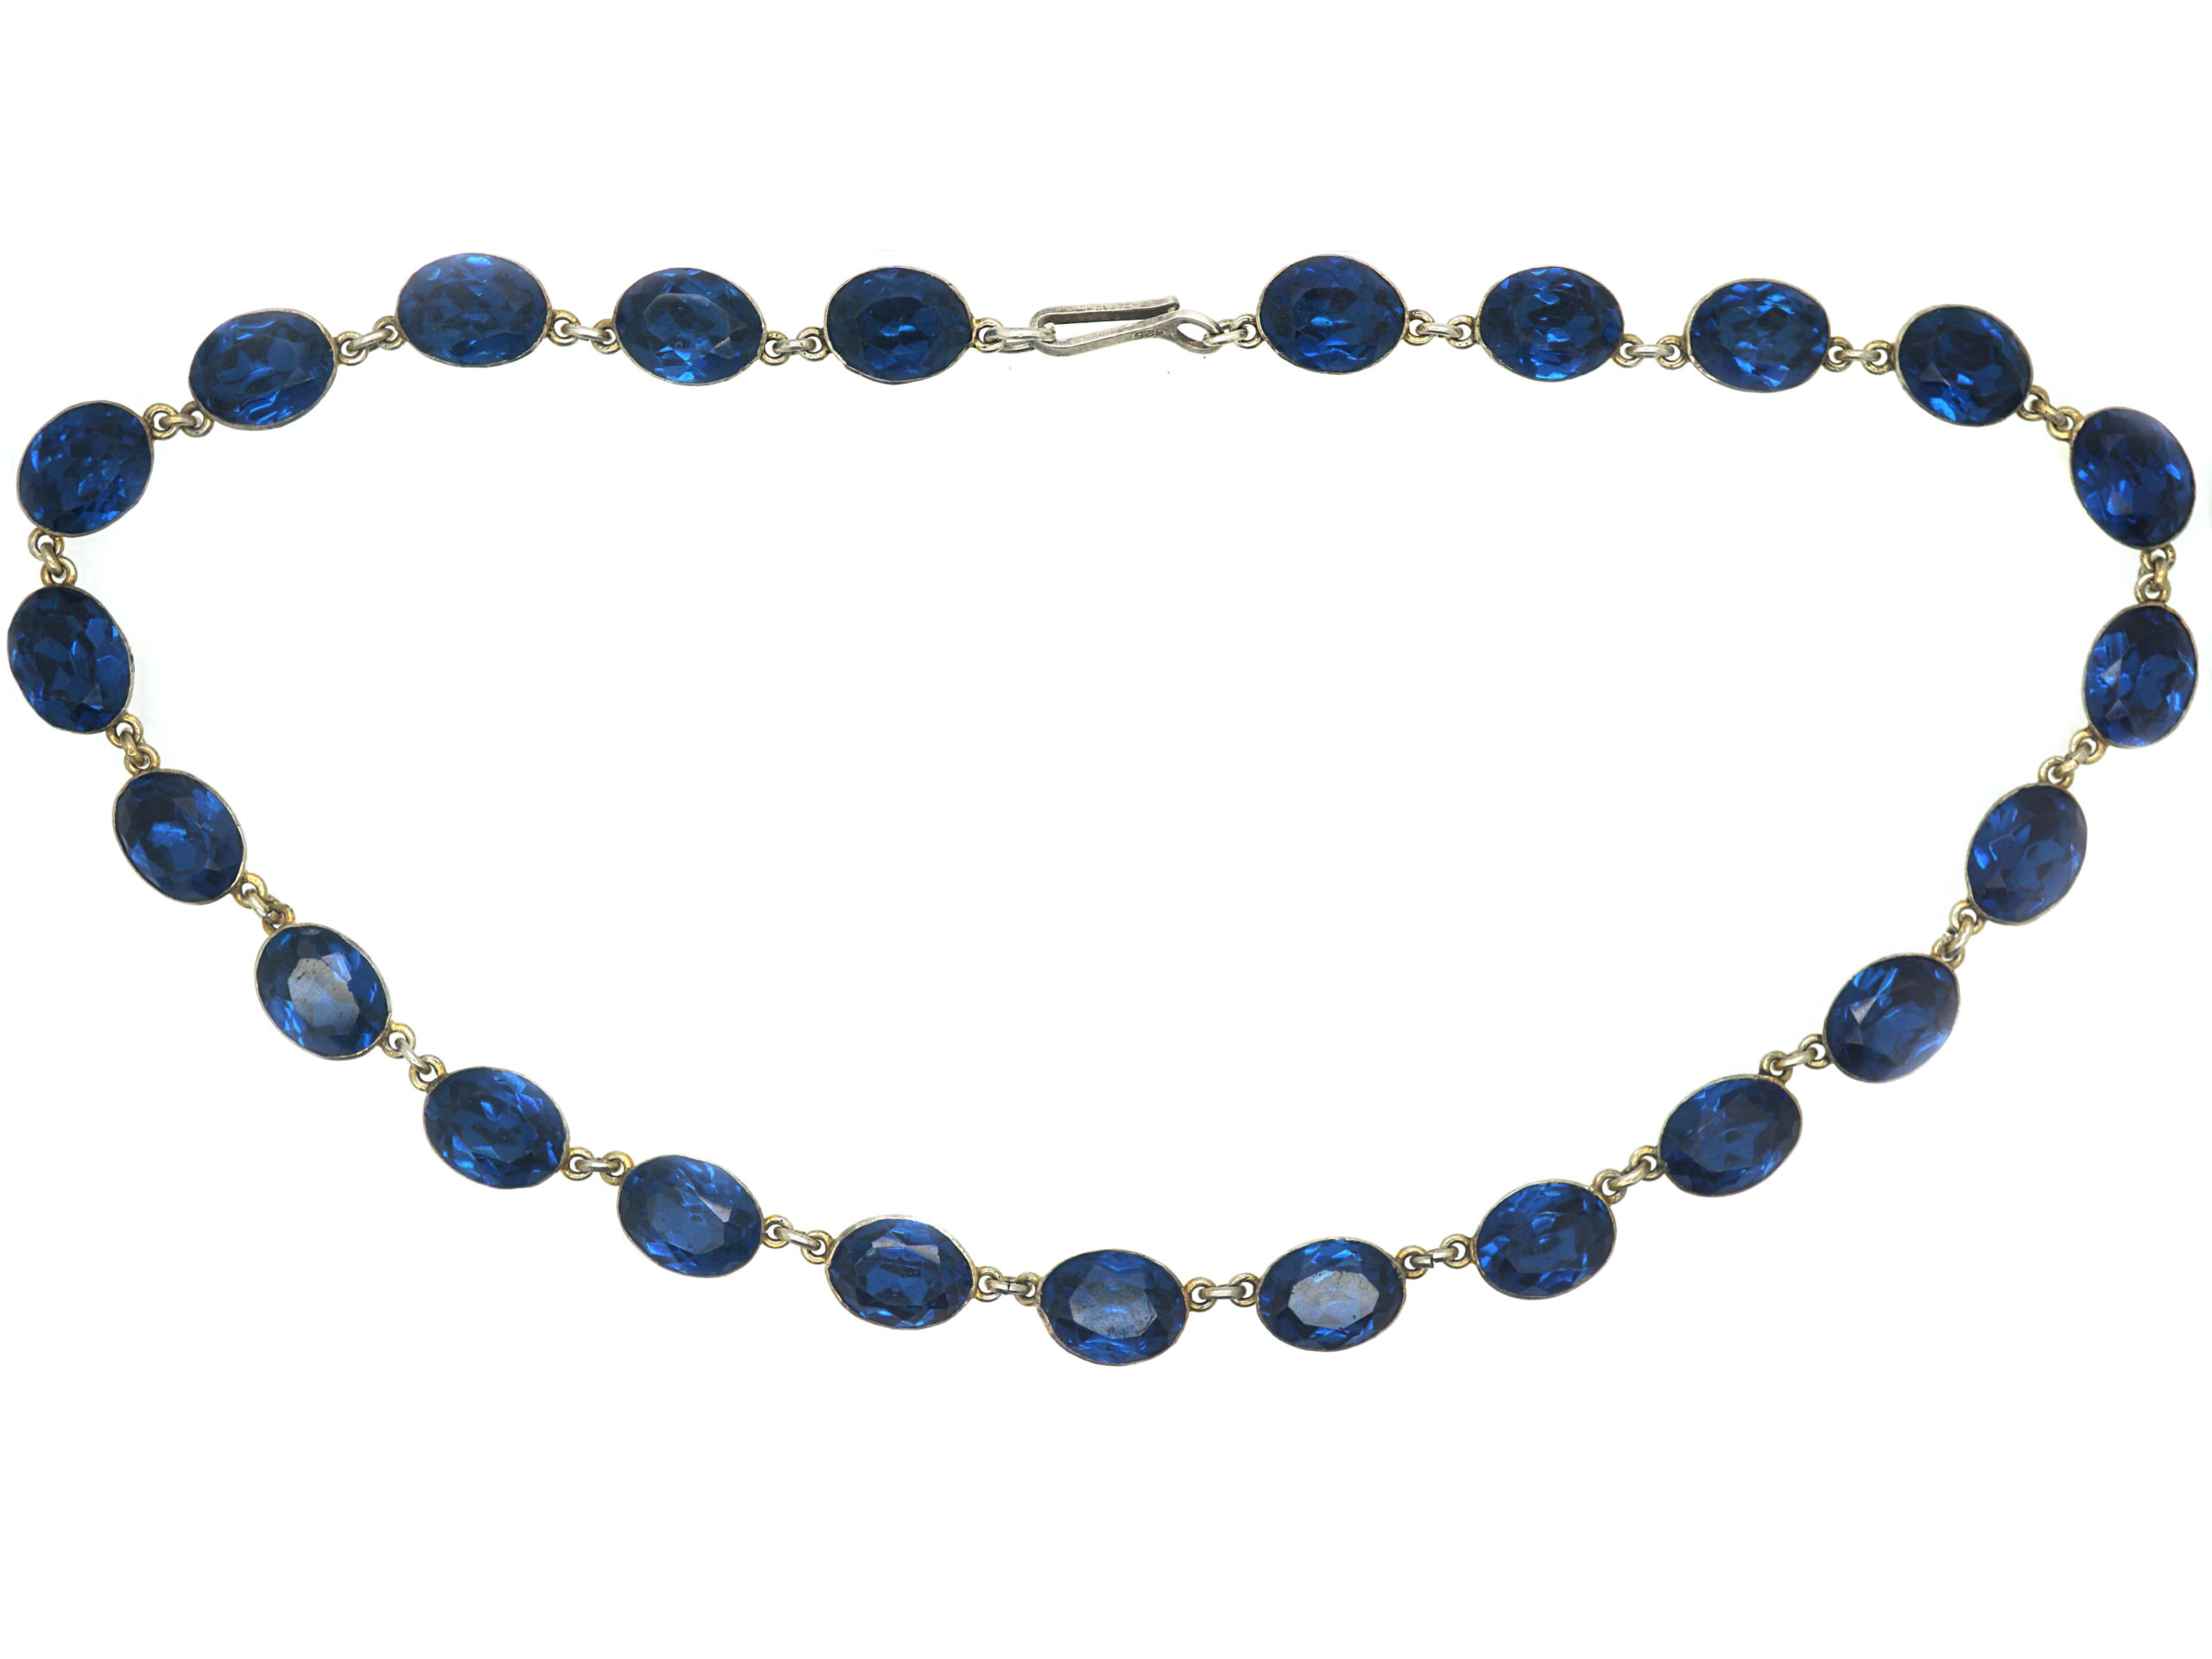 Victorian Silver & Blue Paste Riviere Necklace